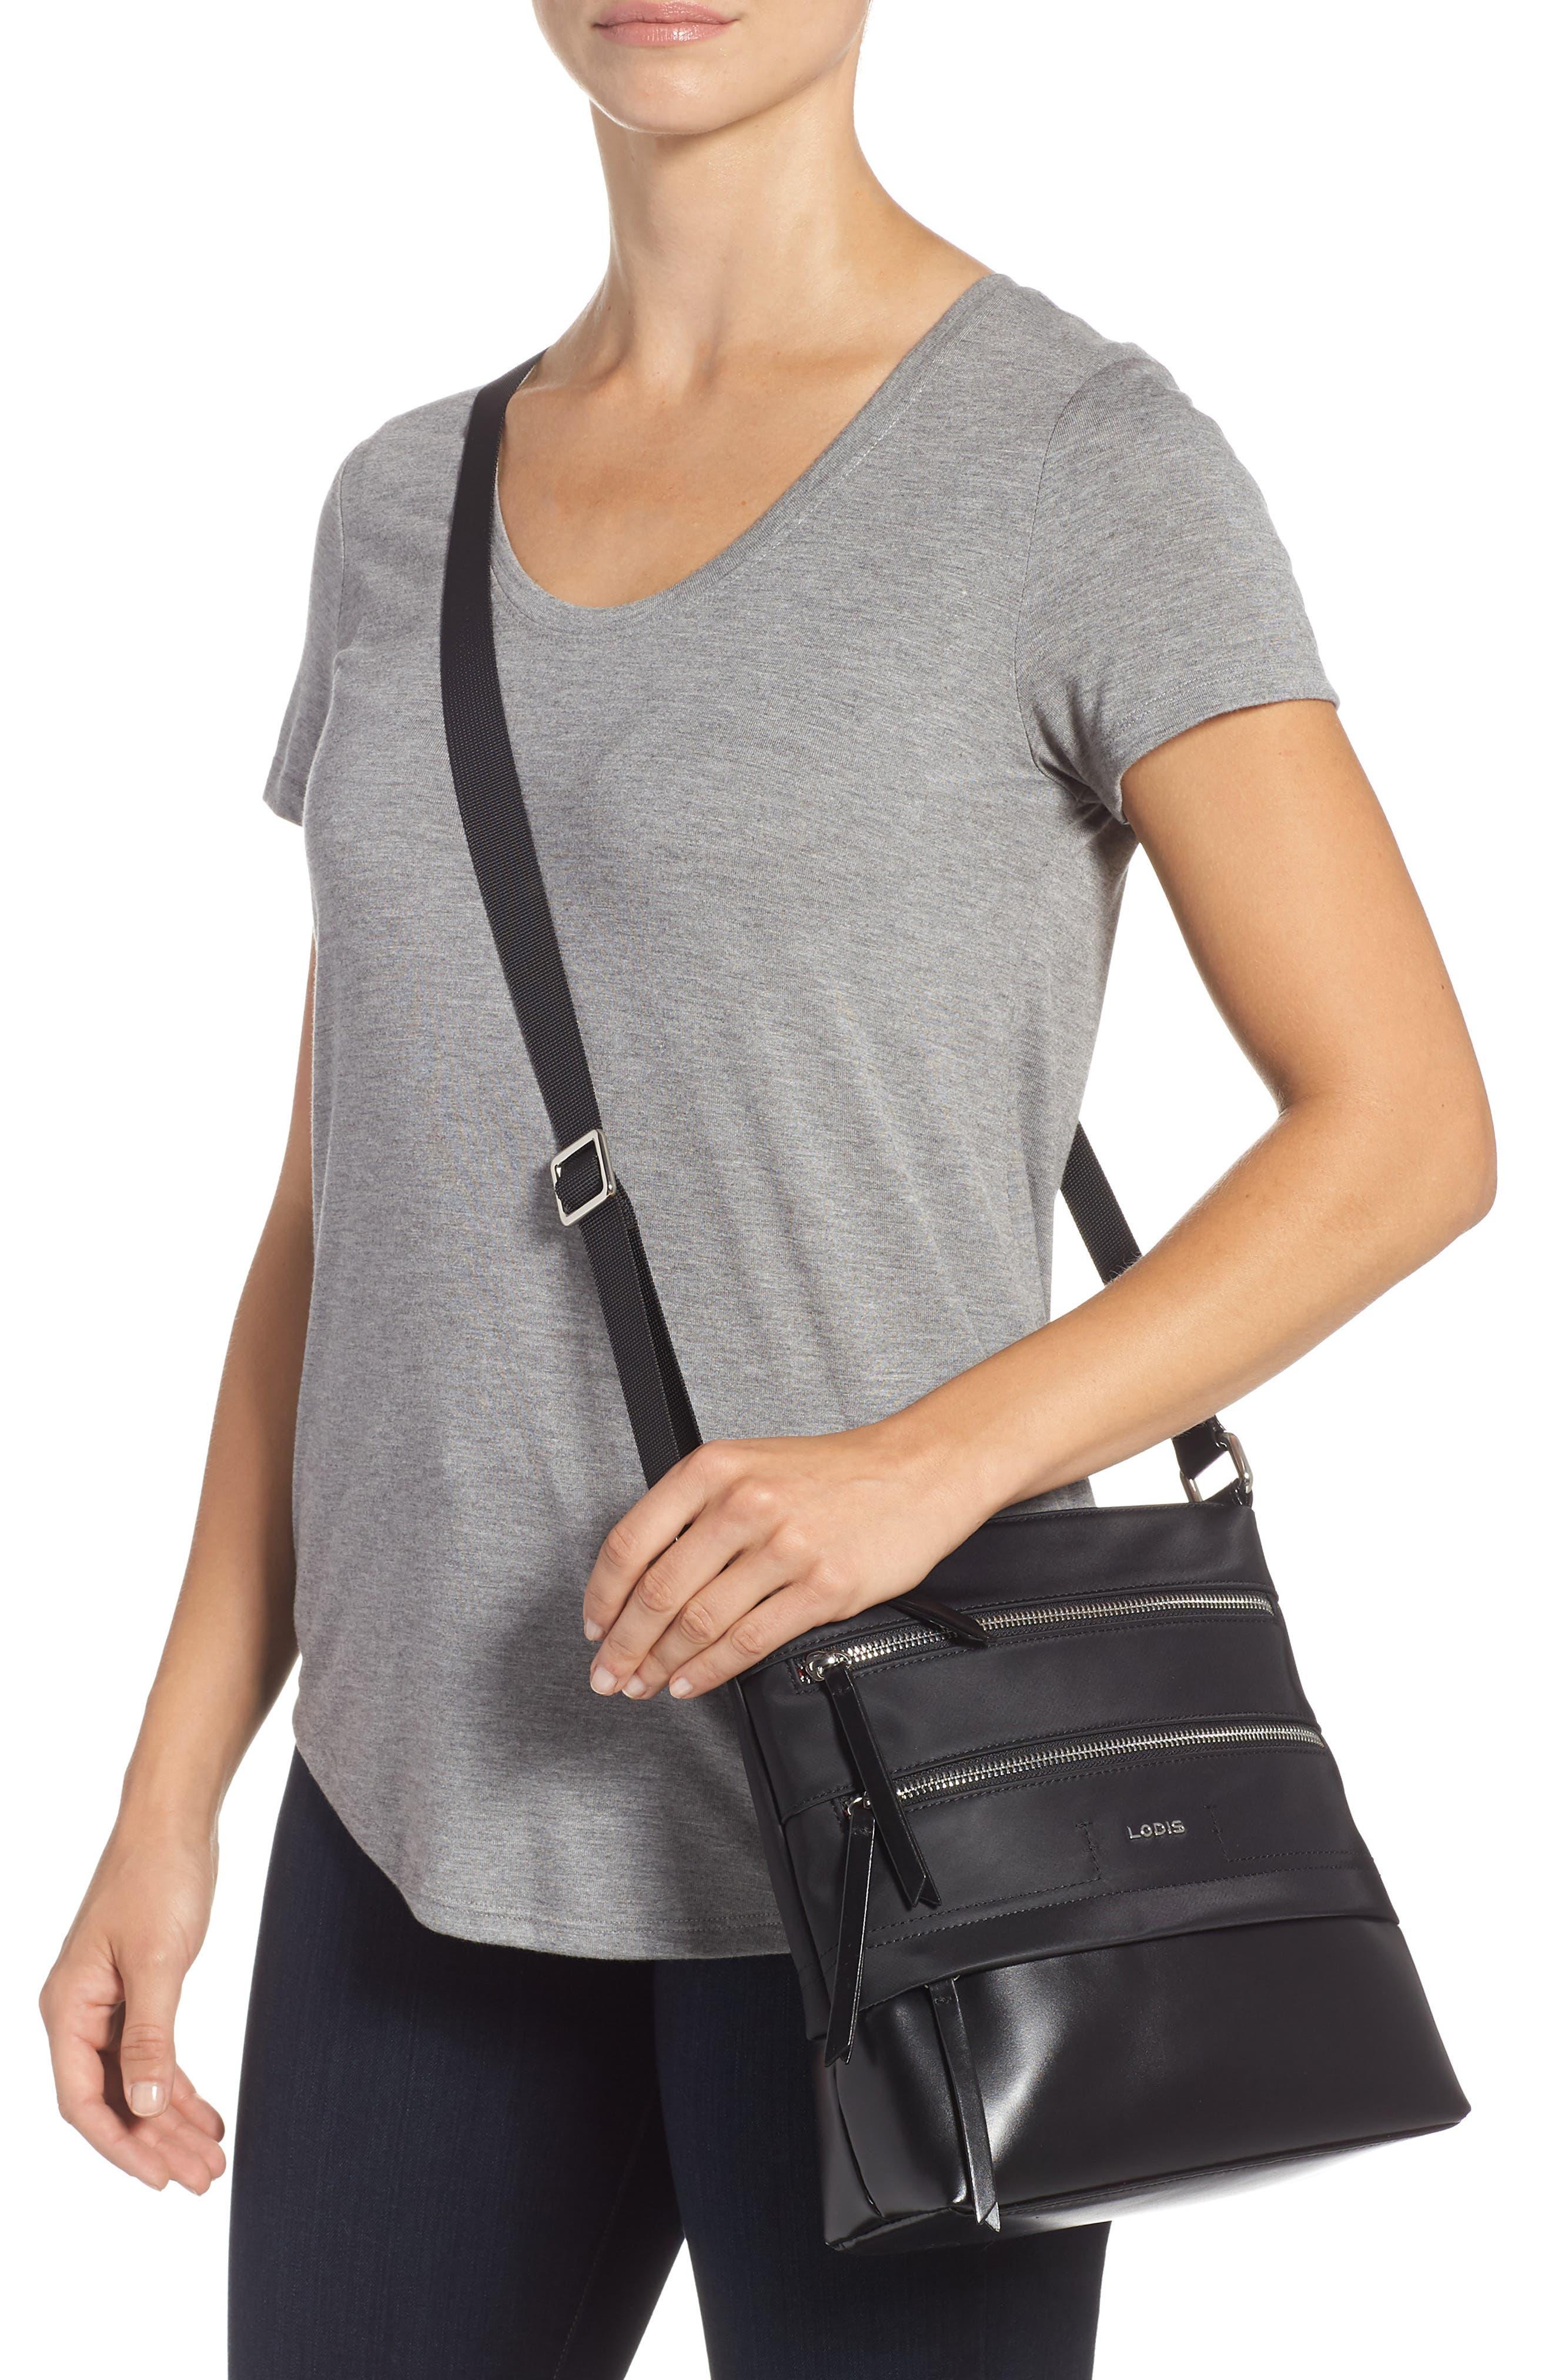 Wanda Nylon Sport RFID Travel Crossbody Bag,                             Alternate thumbnail 2, color,                             BLACK